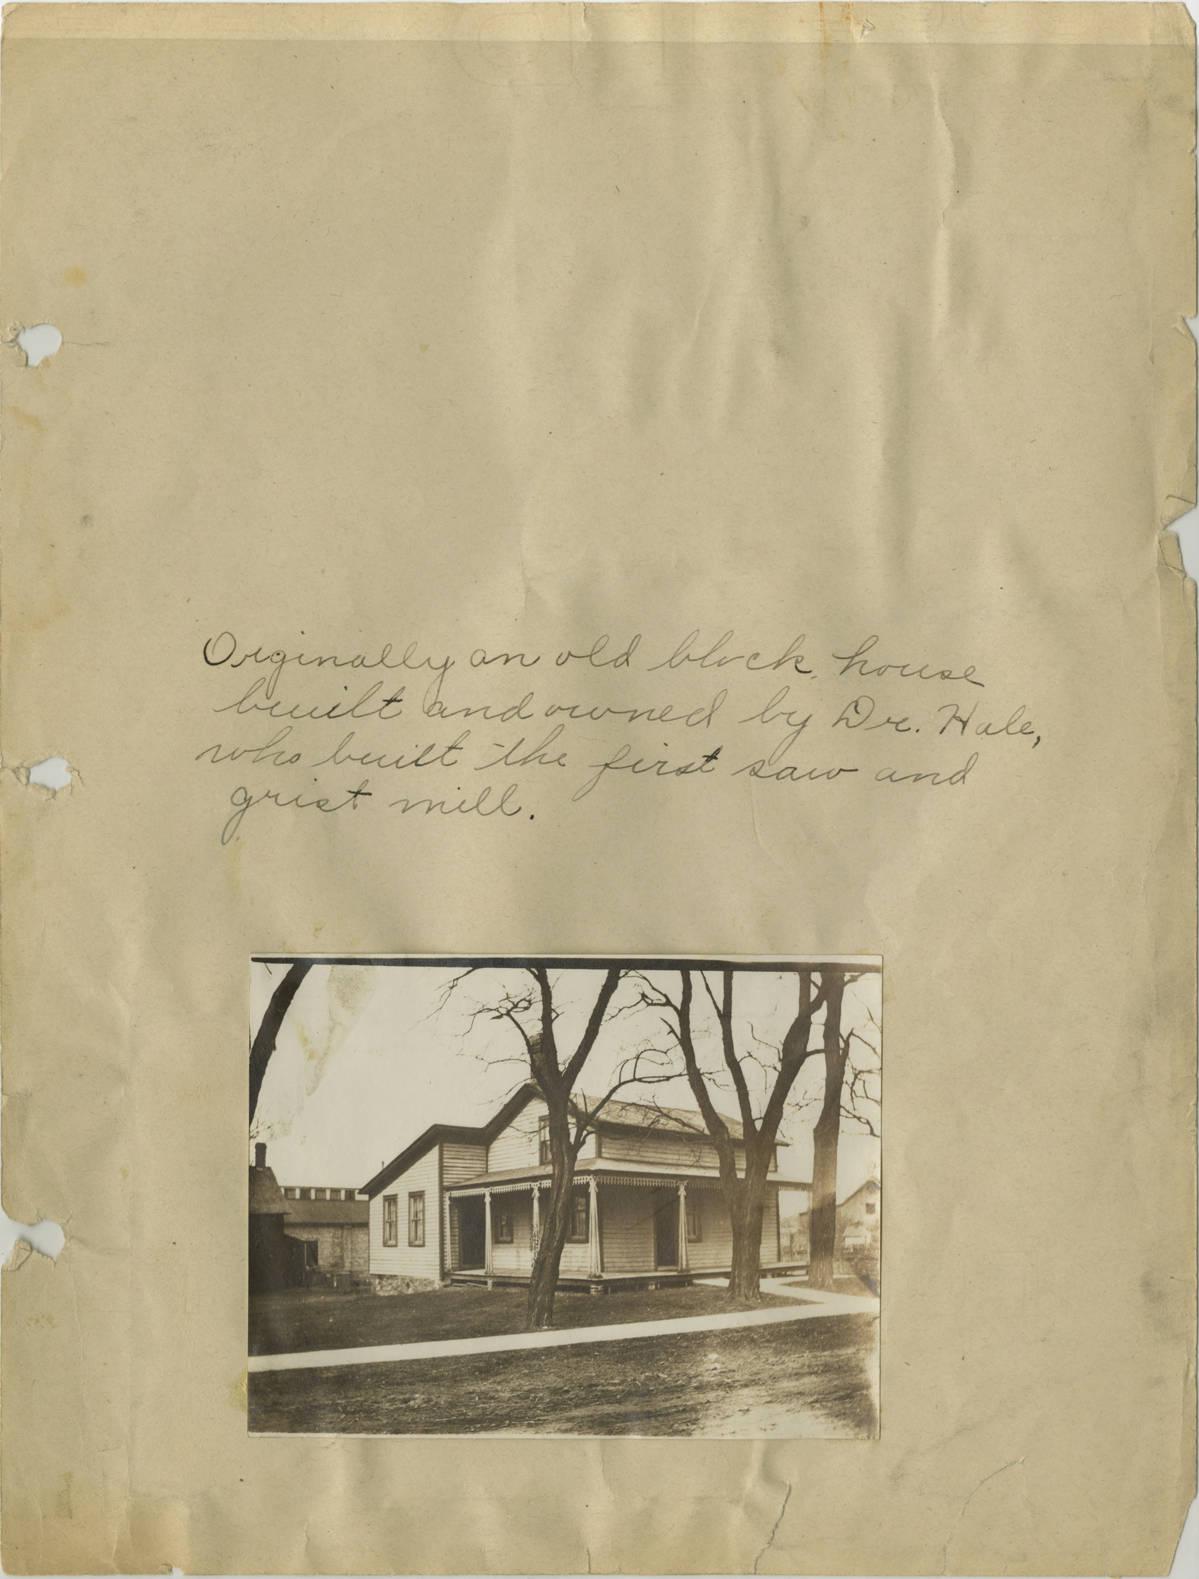 C:\Users\Vern\Documents\Fort Hill\1918 Schools Centennial\1918 Wauconda Twp Glynch School\1918_School_Histories__Wauconda_Township__Glynch_School_2003045_Page_2.jpg